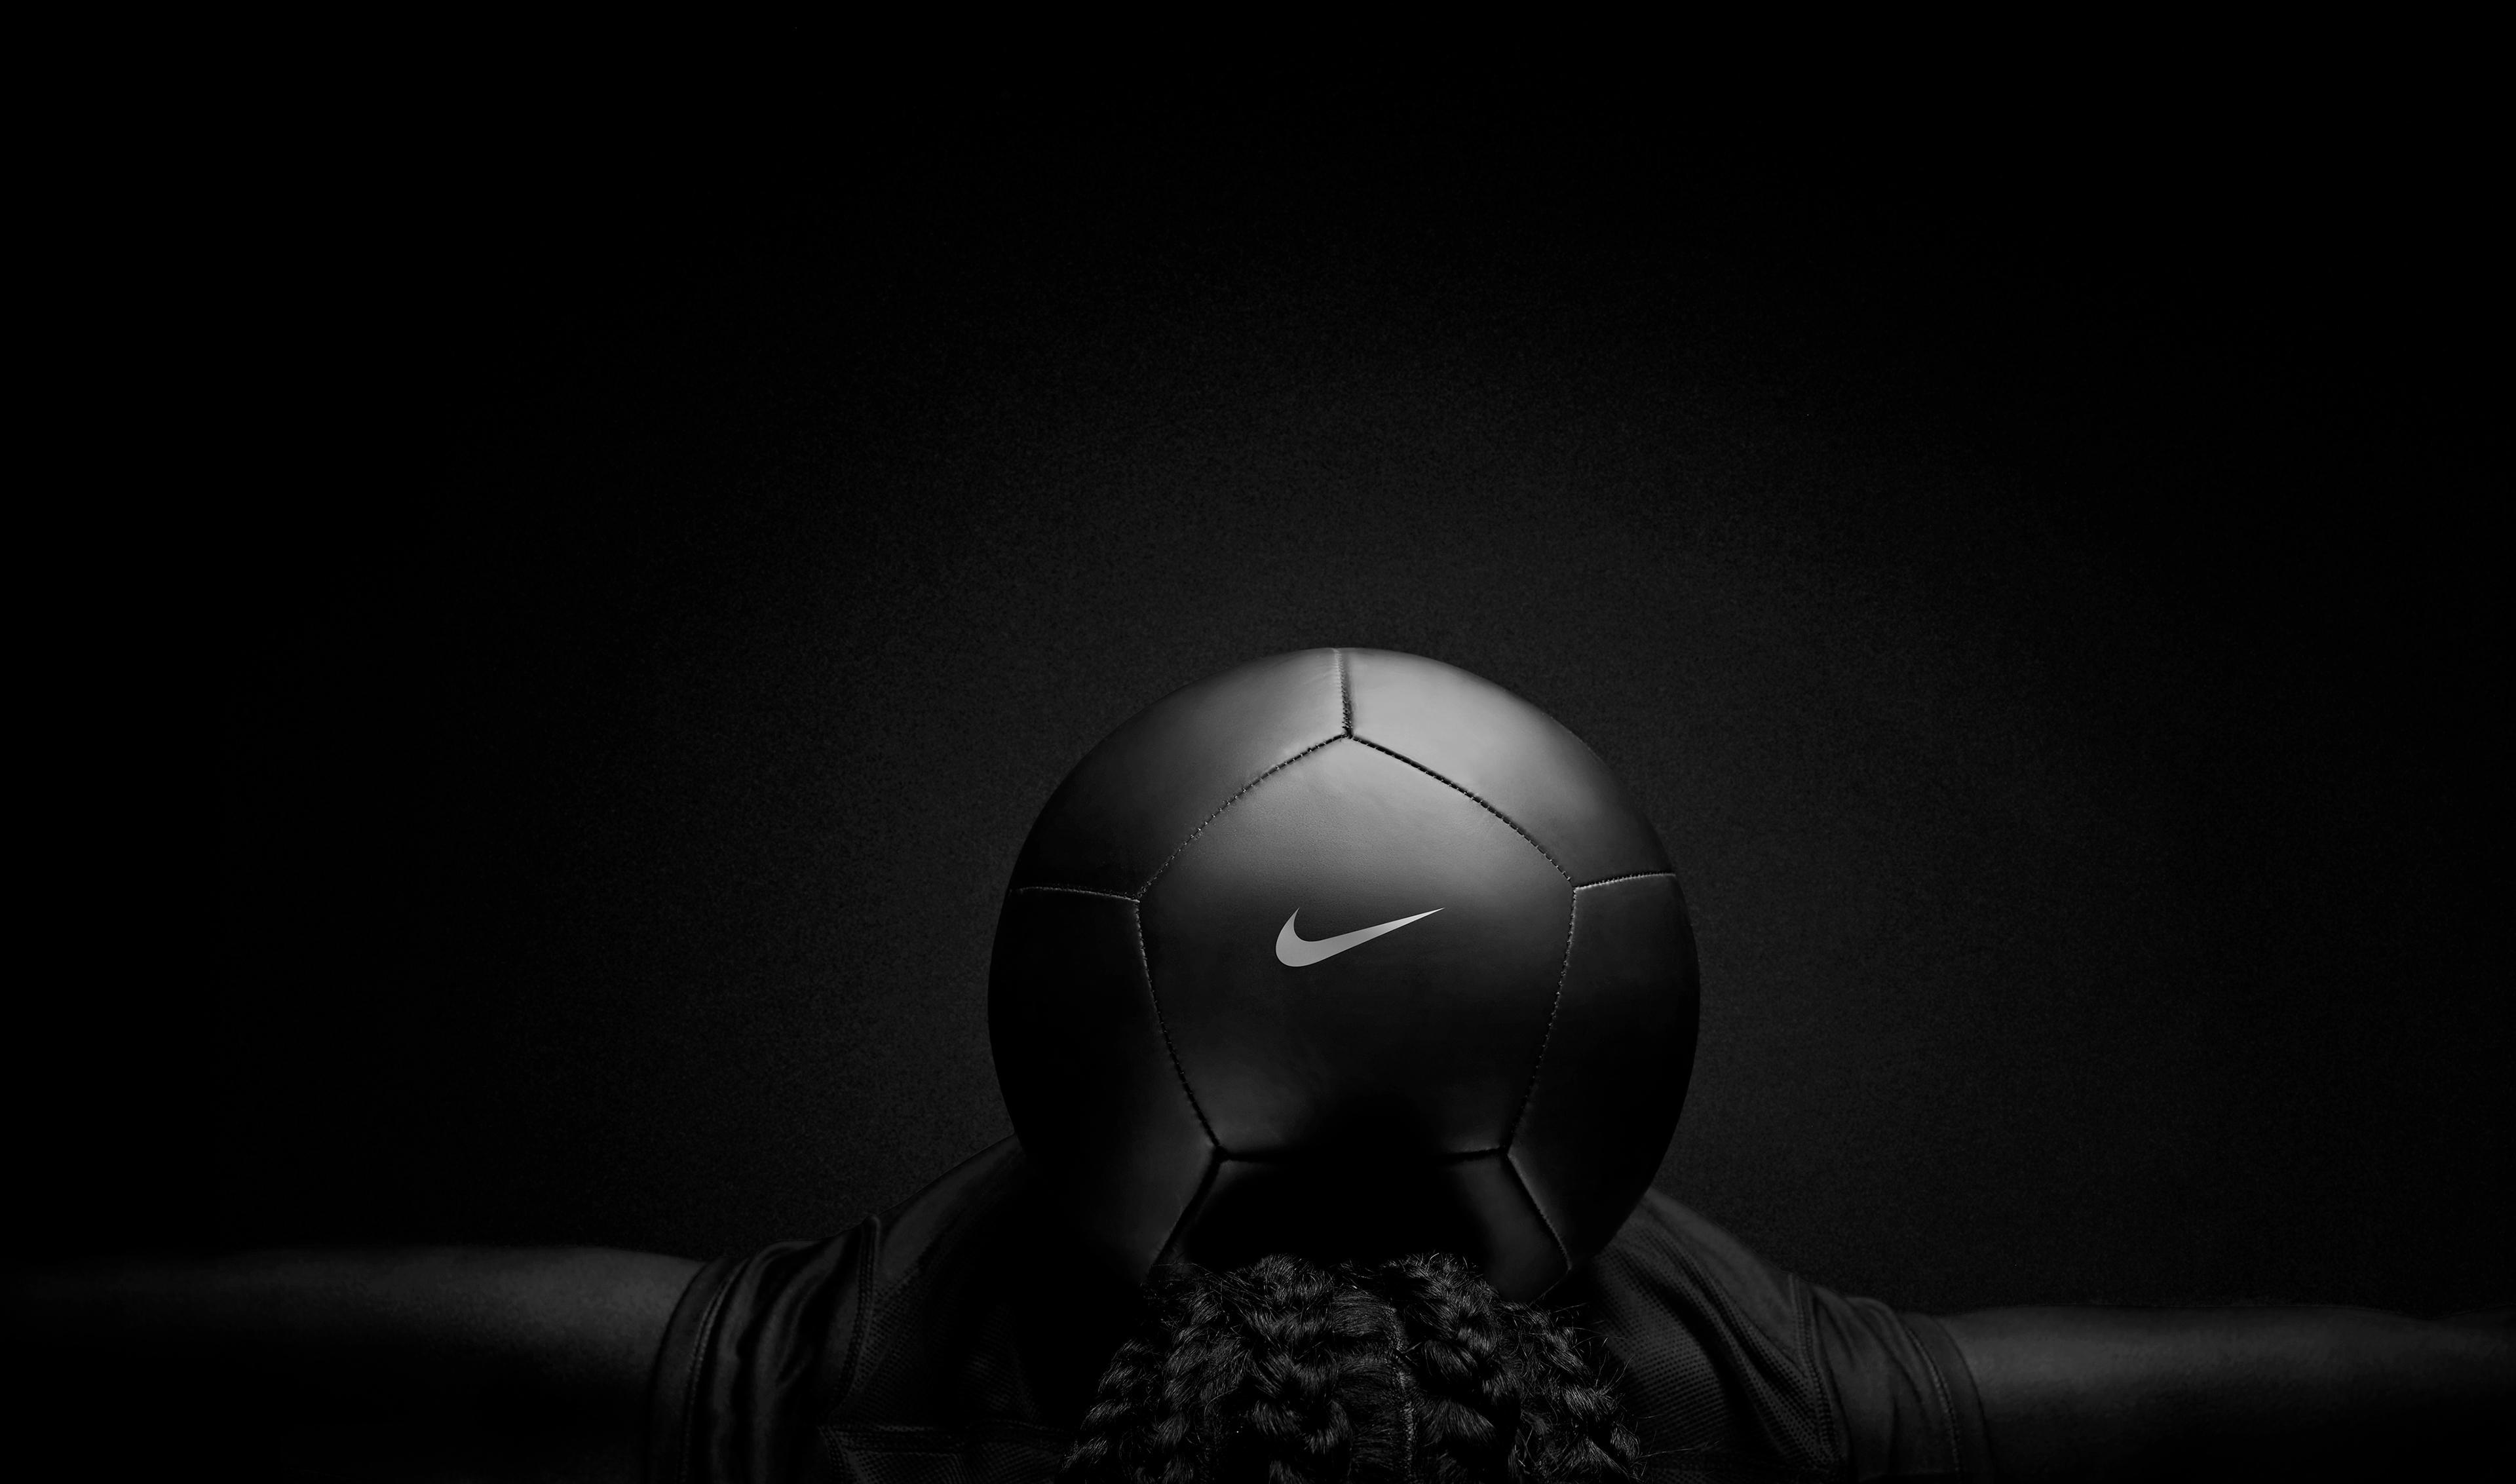 Nike wallpaper football